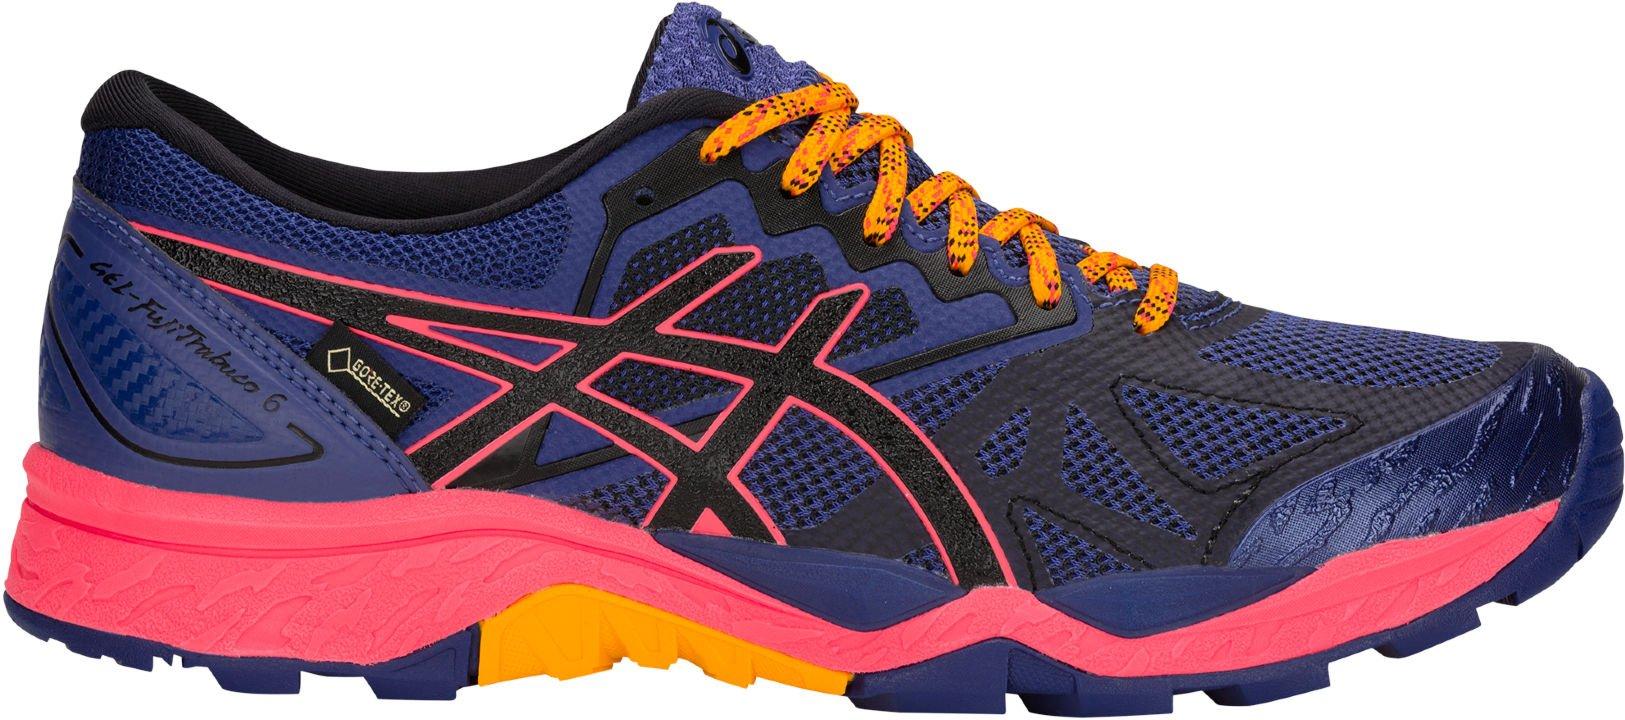 Dámské trailové boty Asics Gel Fujitrabuco 6 G-TX 89a34f76120